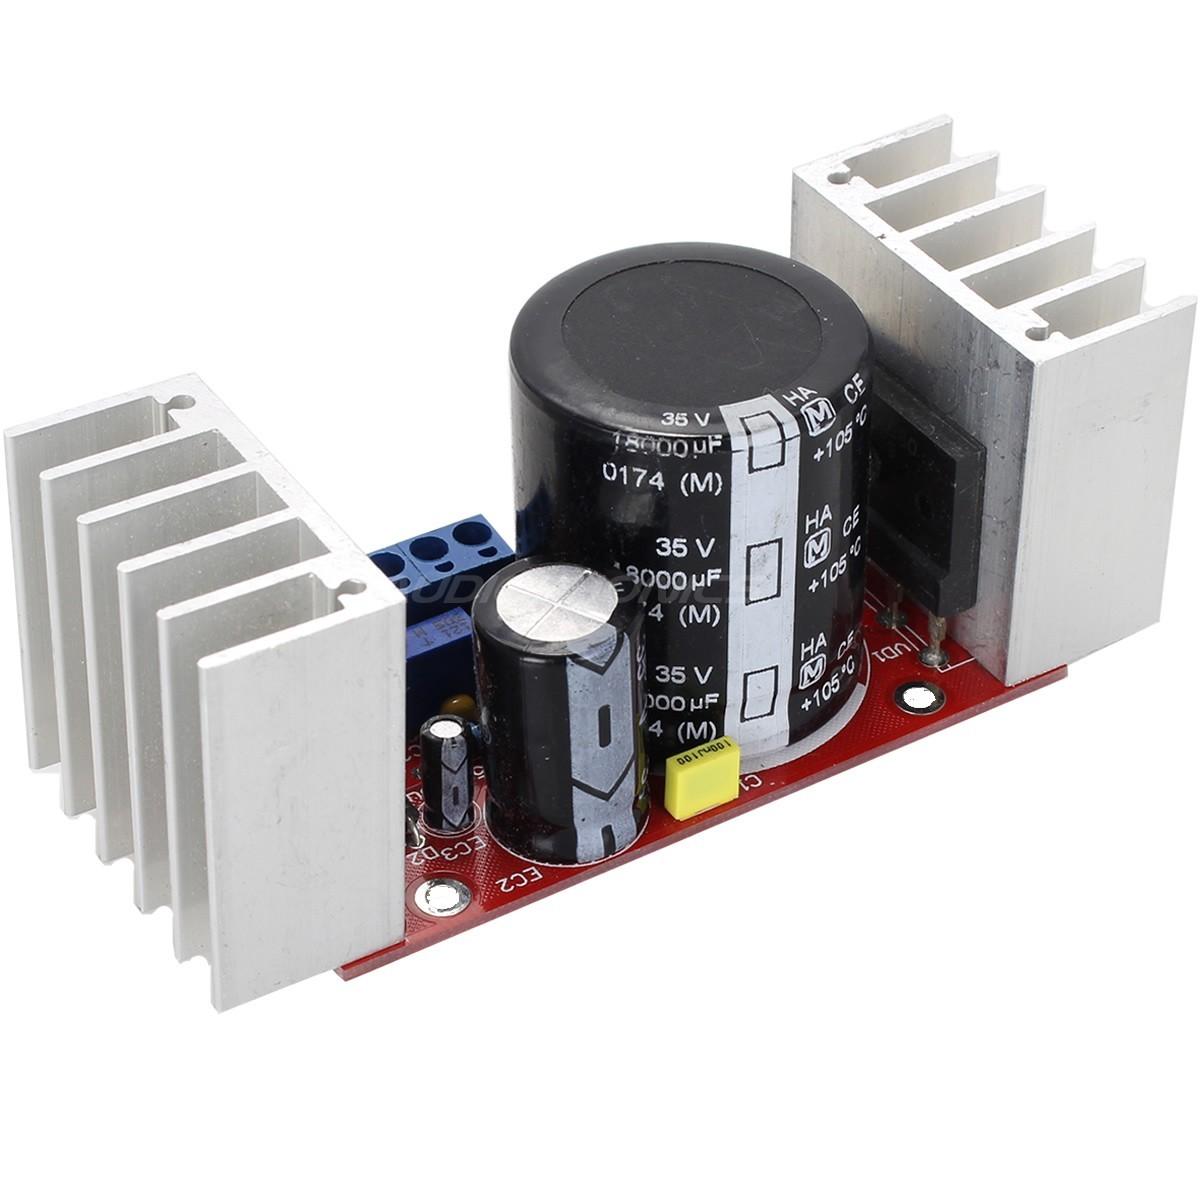 Linear Power Supply board DC LT1083 2.5V to 30V 6A